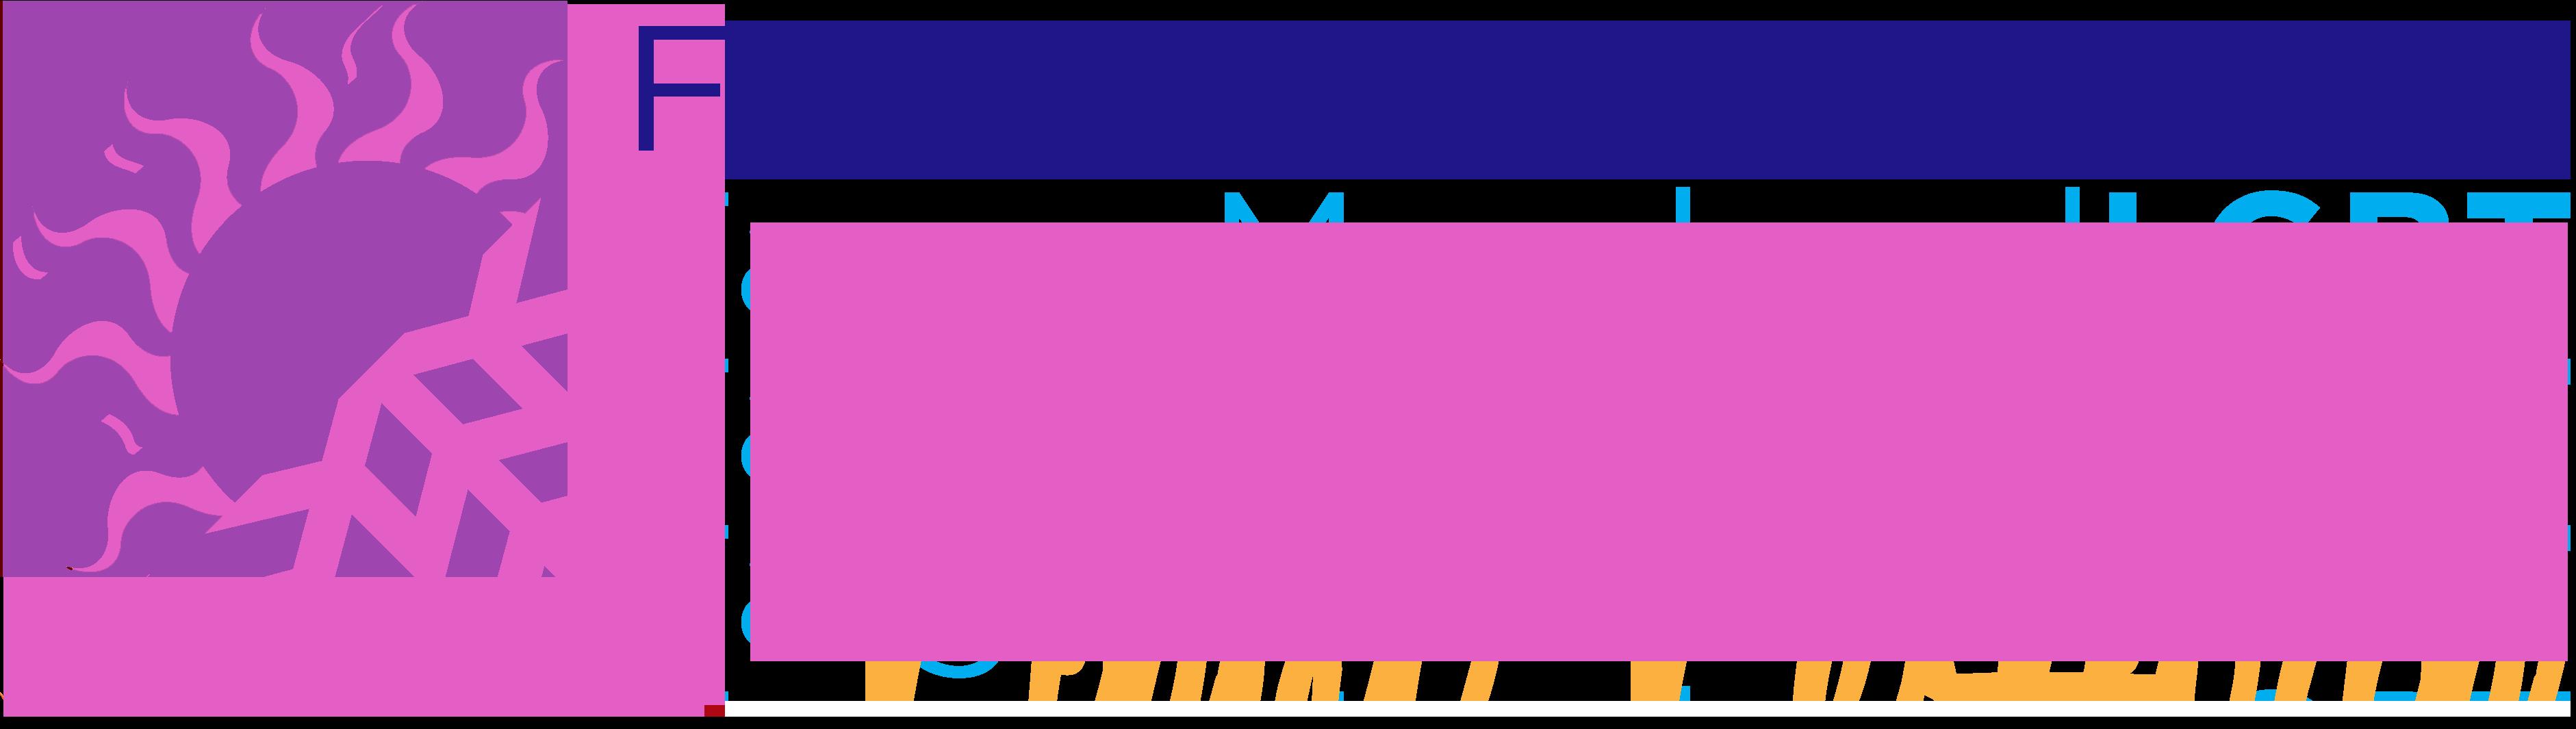 Fargo-Moorhead LGBT Film Festival